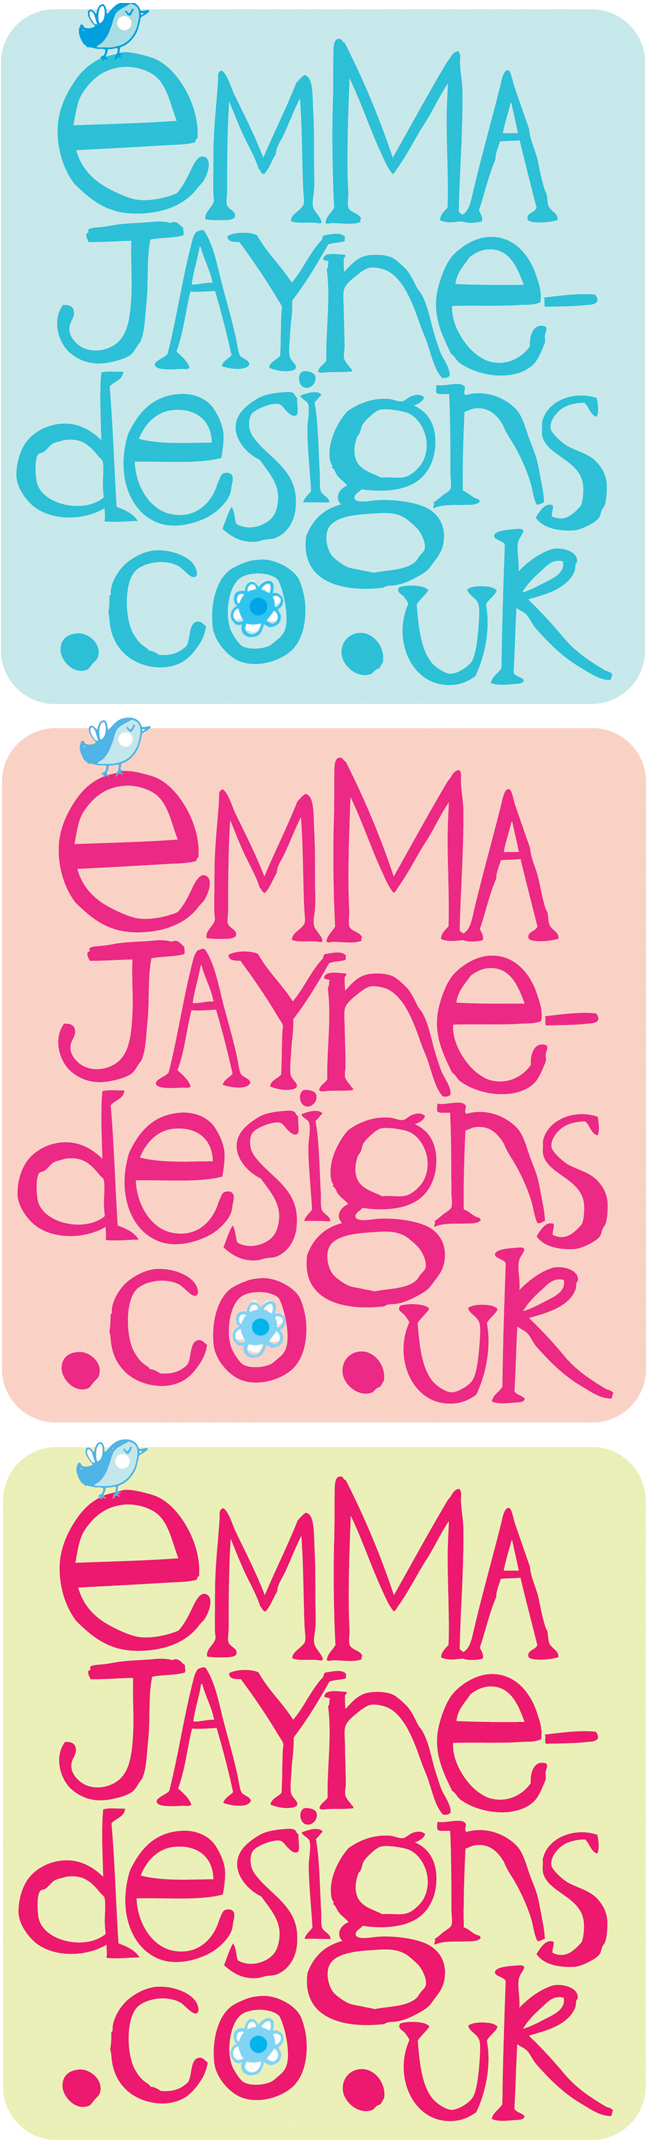 creating-a-logo8-emmajayne-designs